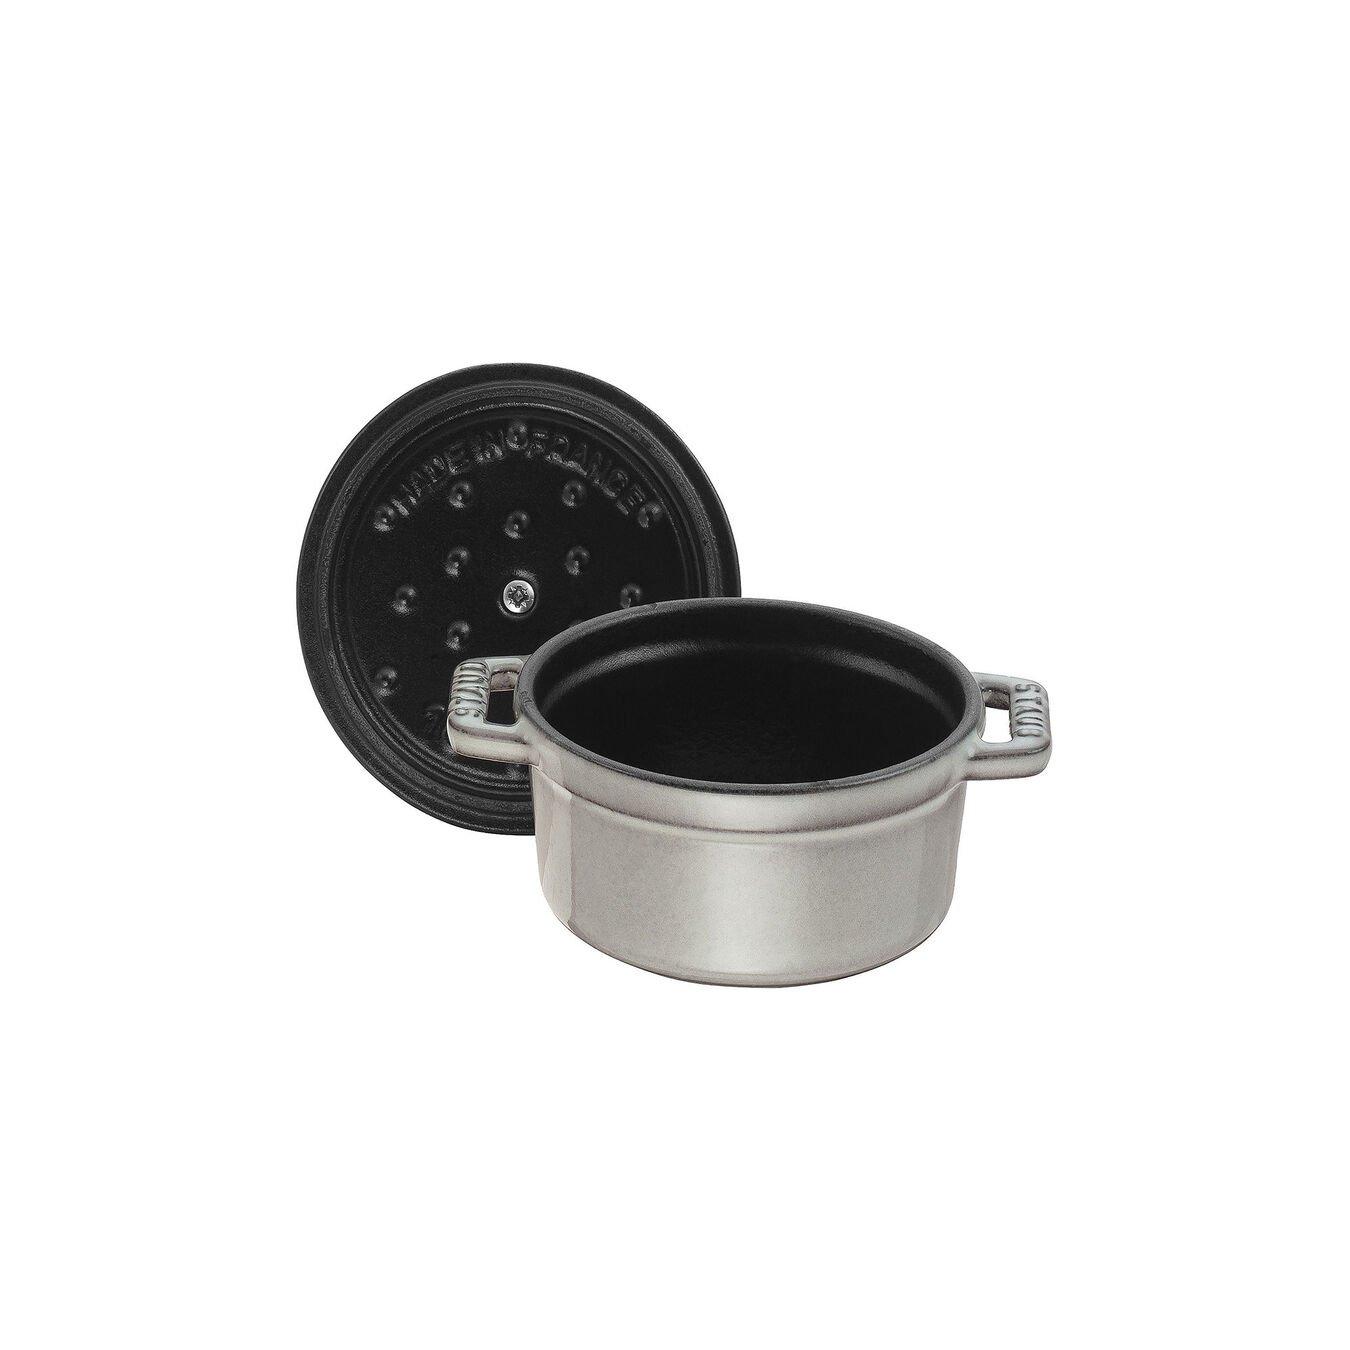 Mini cocotte rotonda - 10 cm, grigio grafite,,large 5